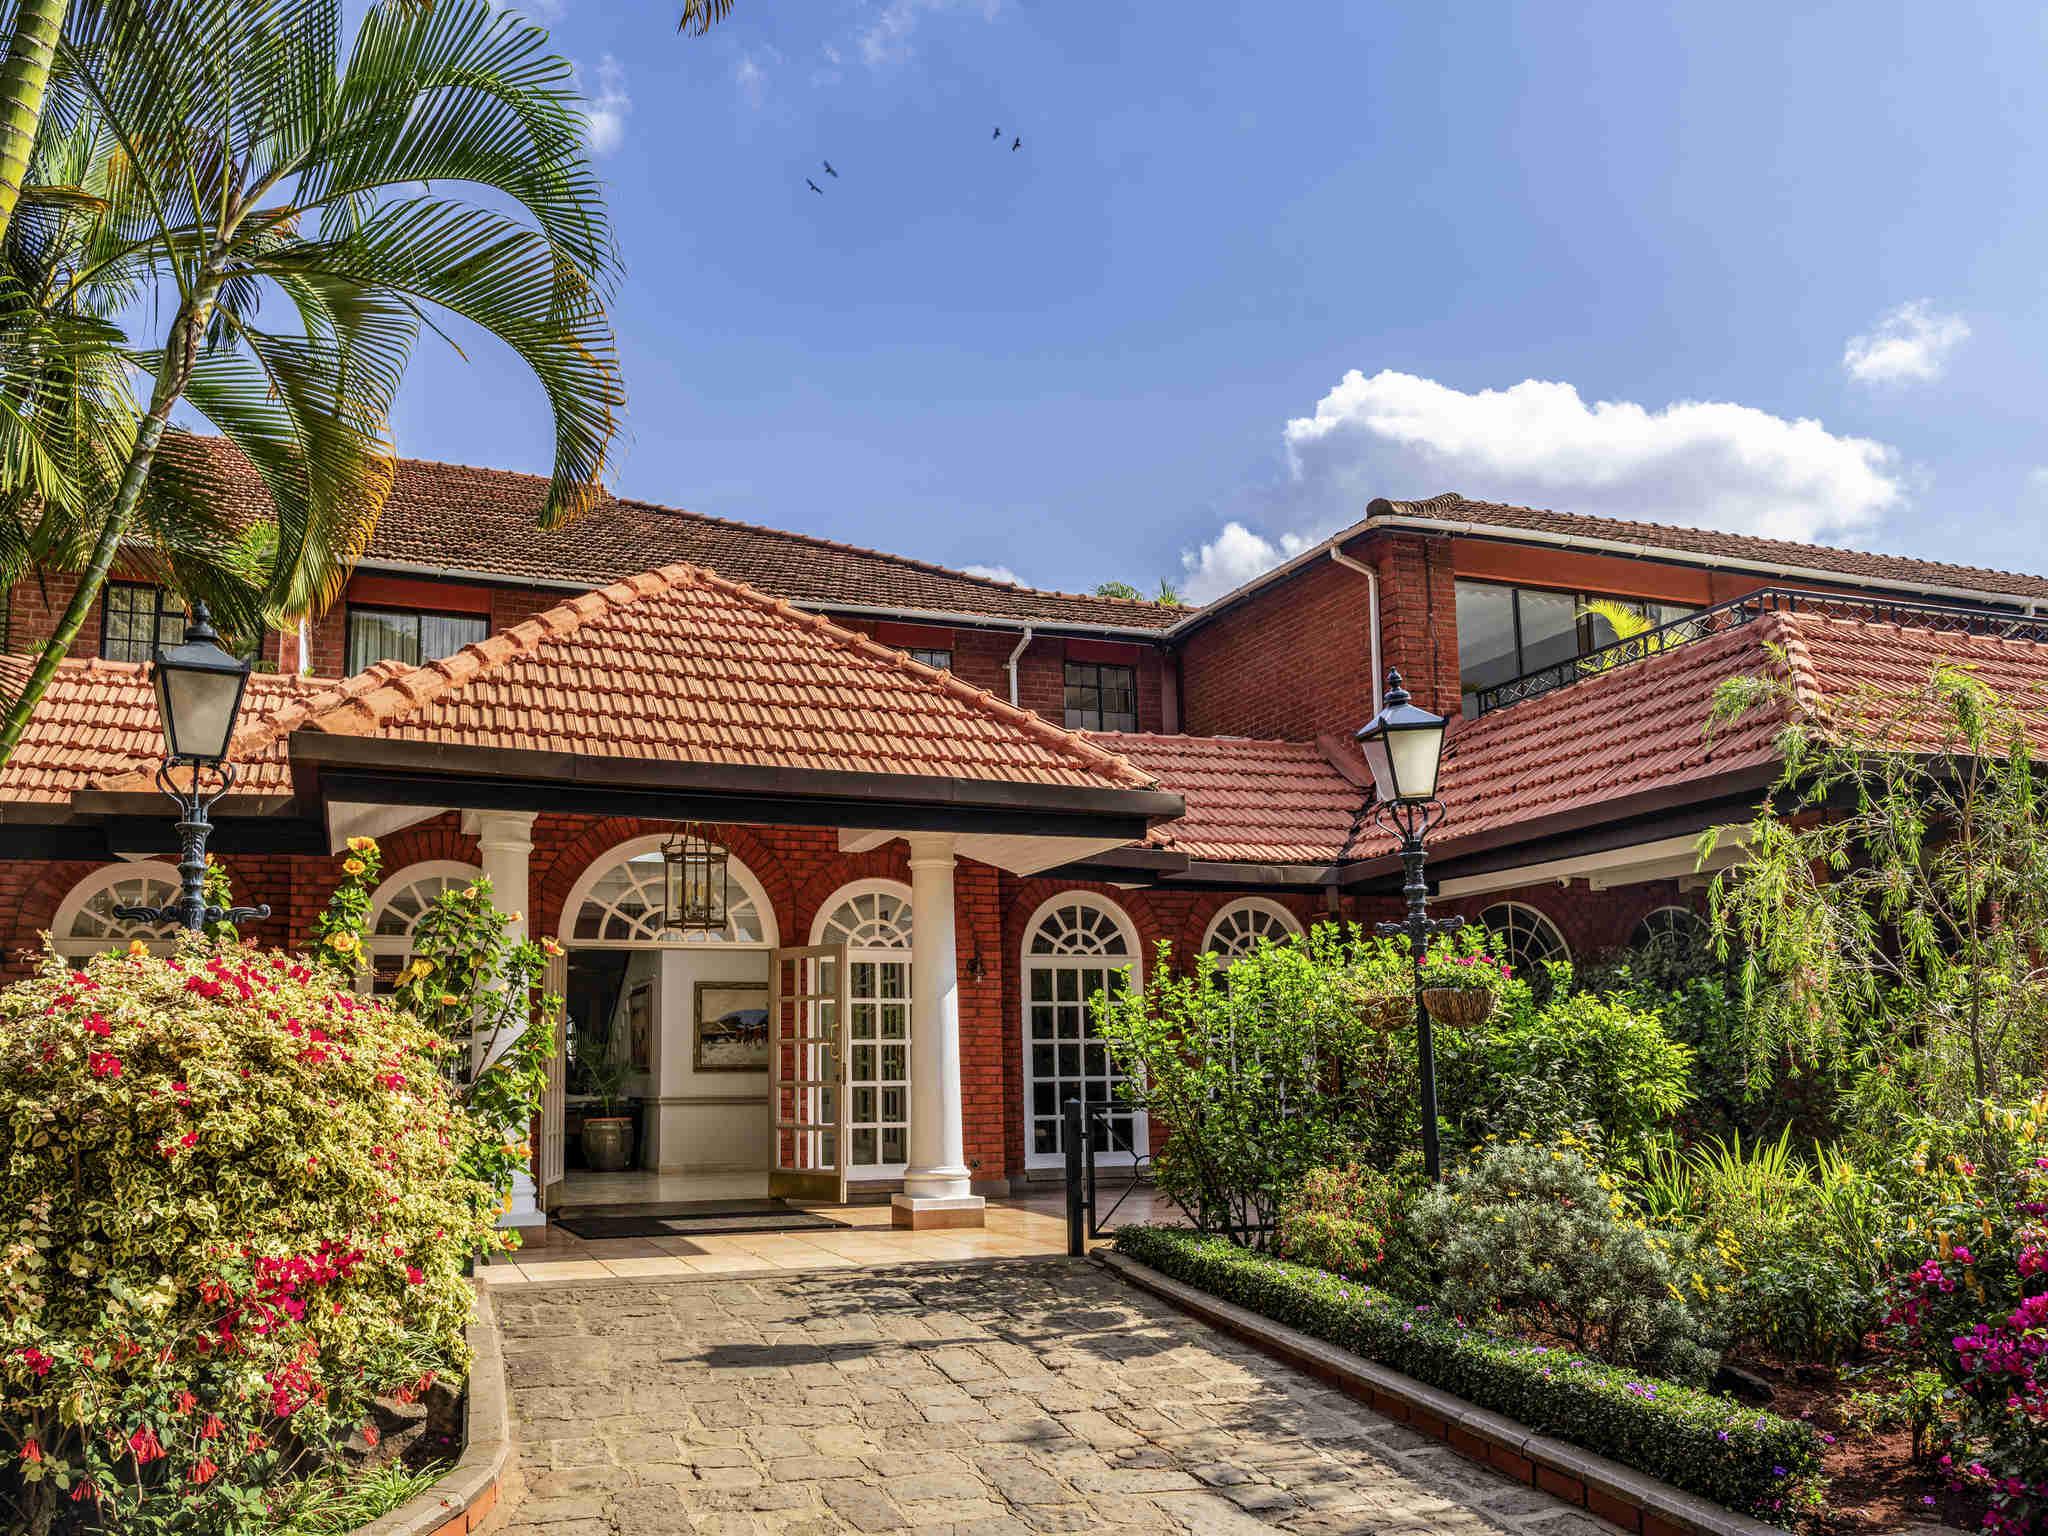 Hotel in NAIROBI - Fairmont The Norfolk